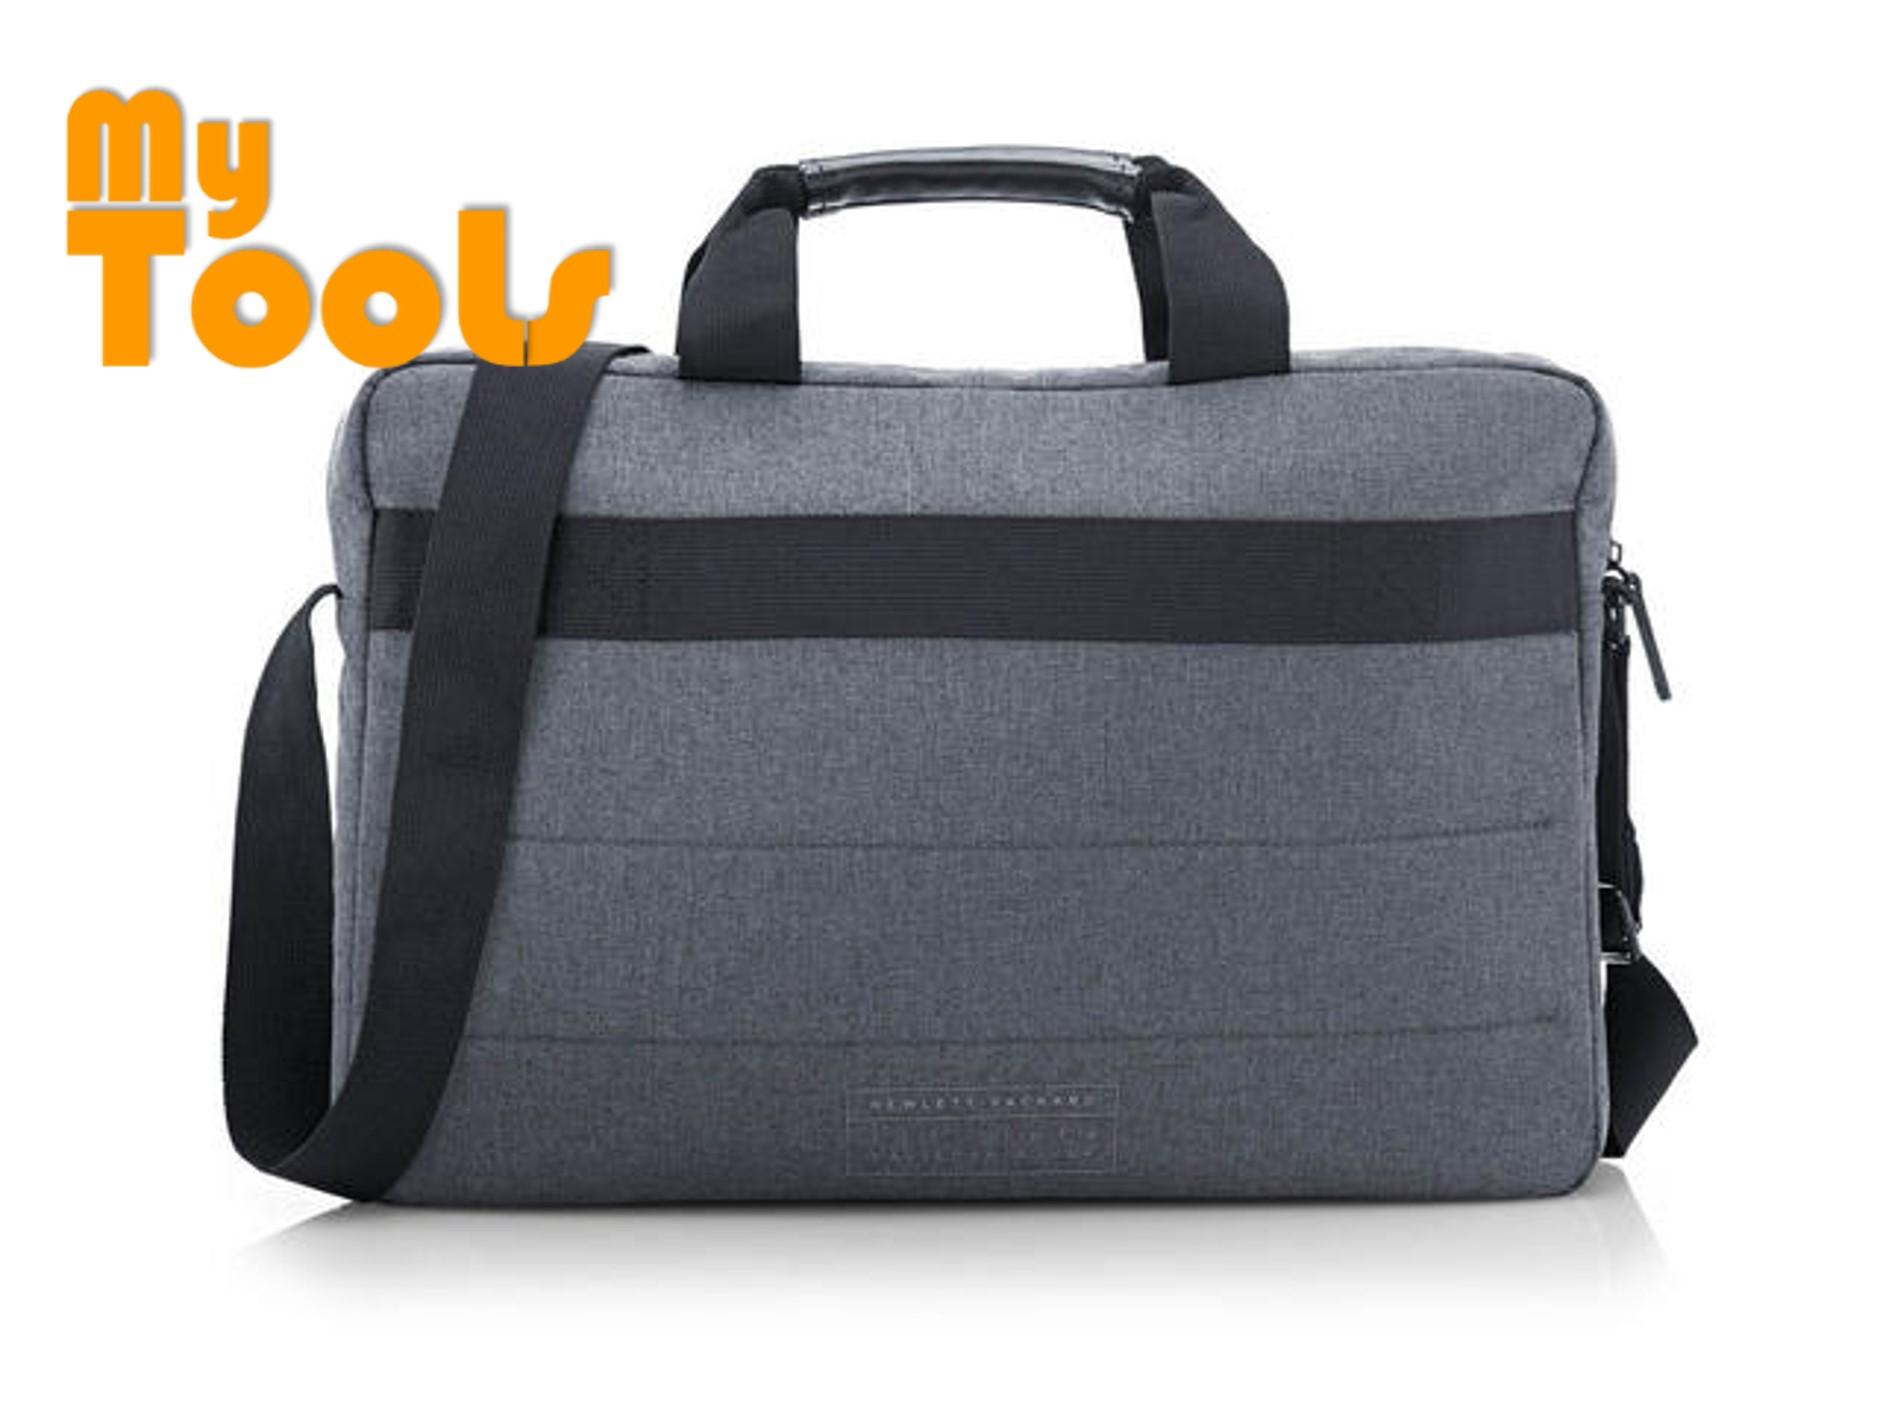 HP Notebook Laptop 15.6 inch Value Topload Shoulder Sling Hand Carry Bag Case K0B38AA